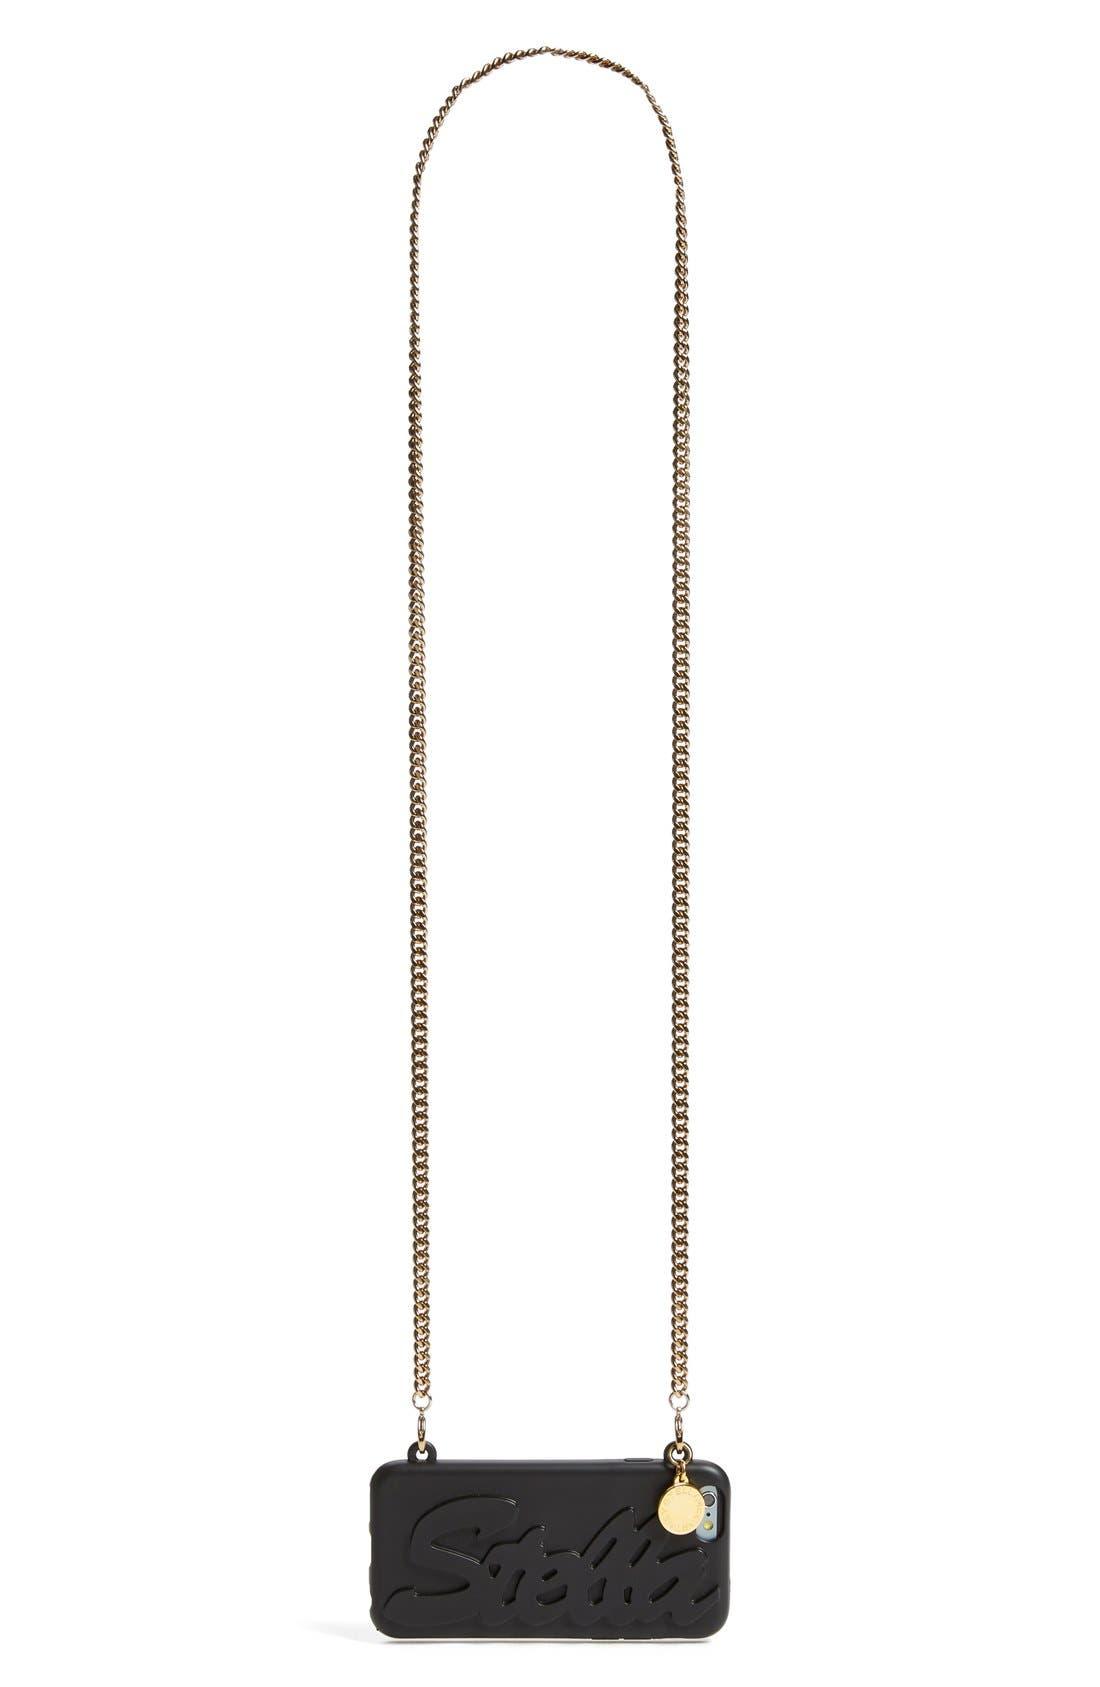 'Stella' iPhone 6 & 6s Crossbody Chain Case,                             Alternate thumbnail 8, color,                             001